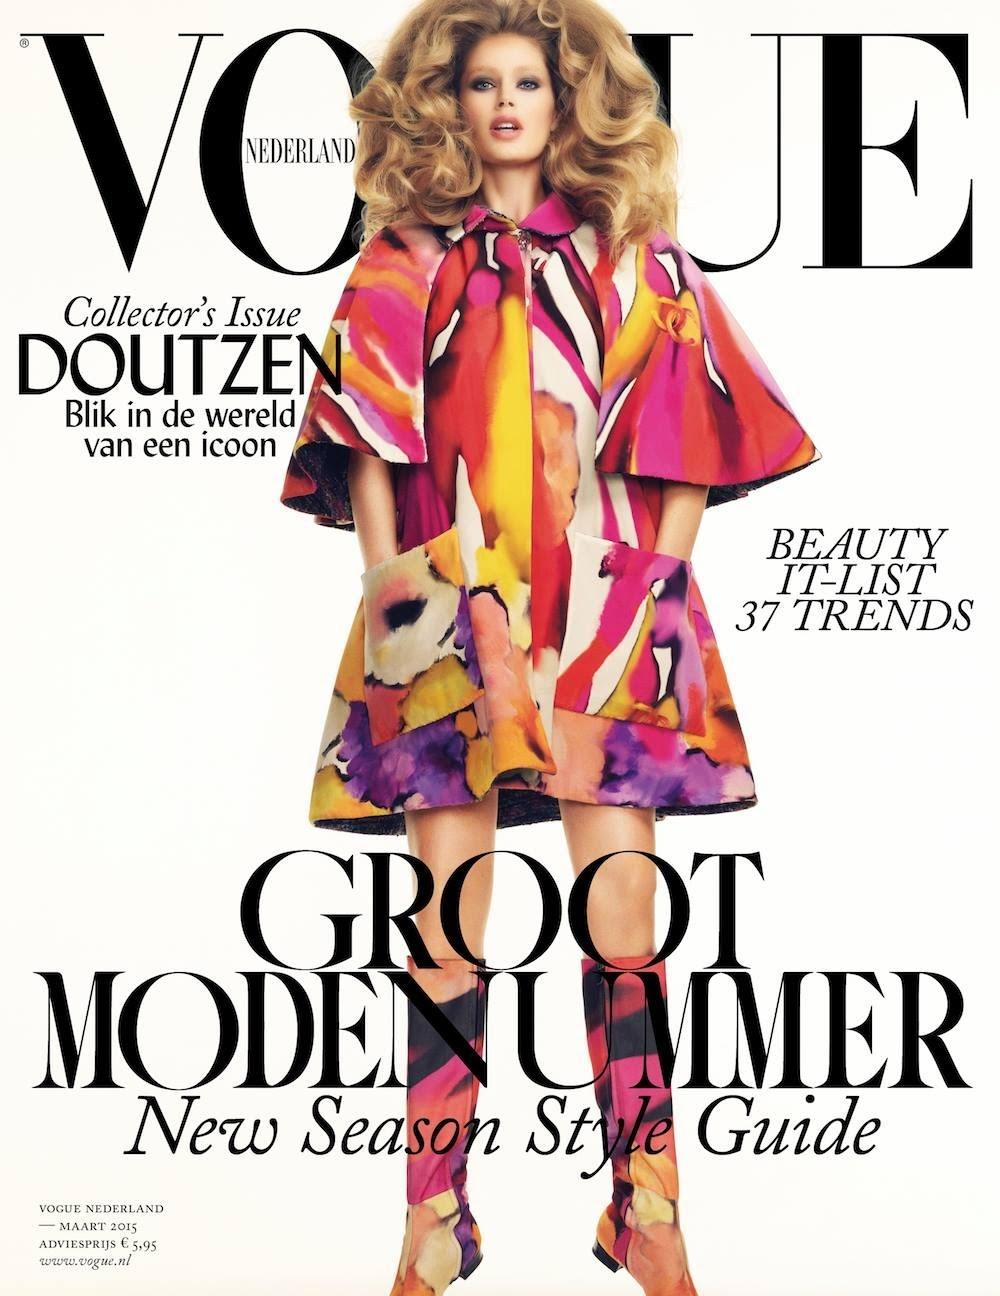 Model, Actress: Doutzen Kroes for Vogue Netherlands